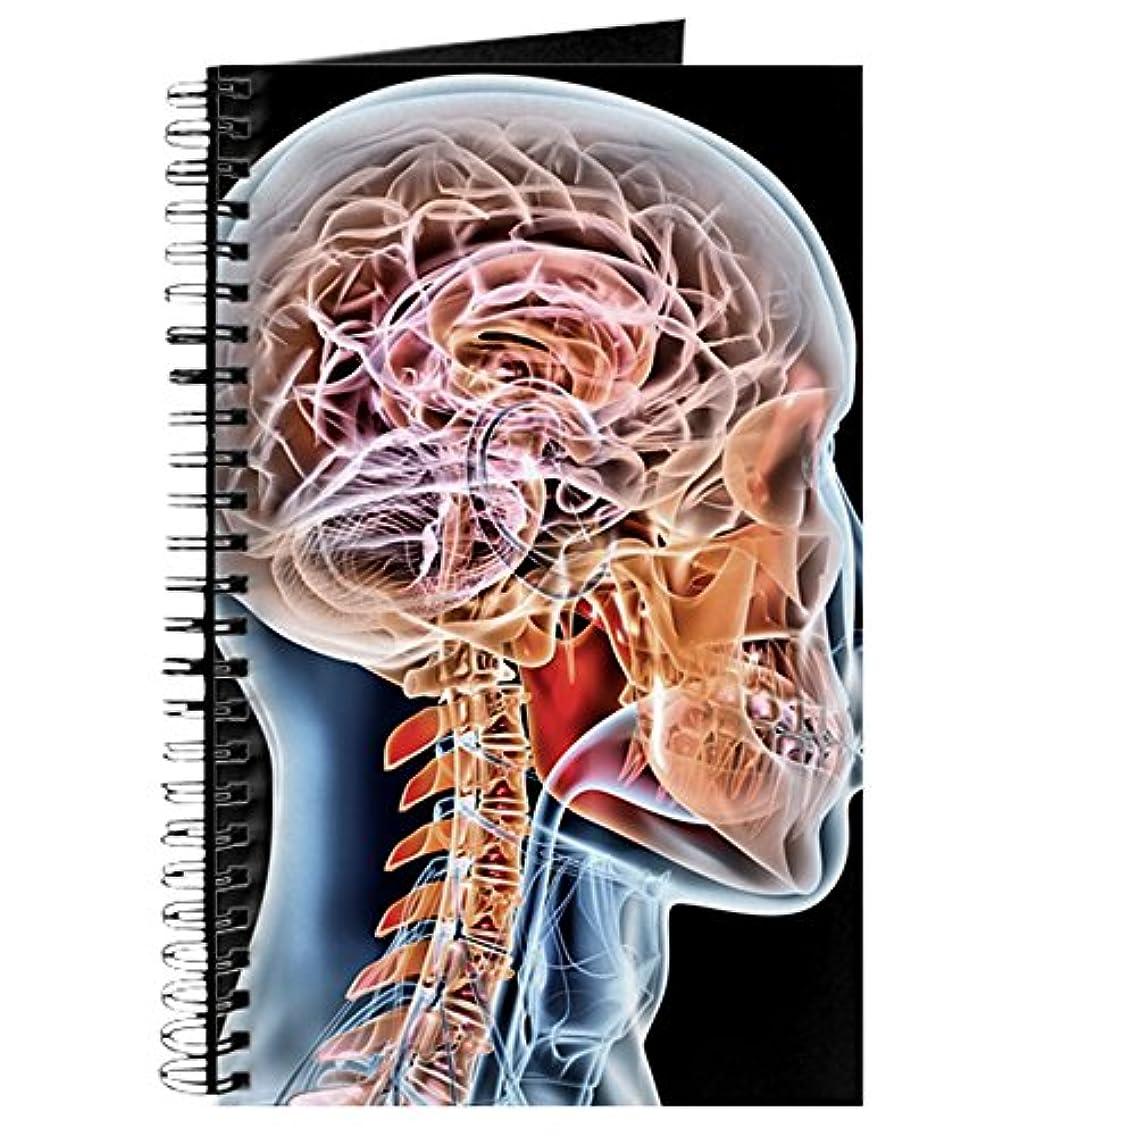 CafePress Internal Brain Anatomy, Artwork Spiral Bound Journal Notebook, Personal Diary, Lined